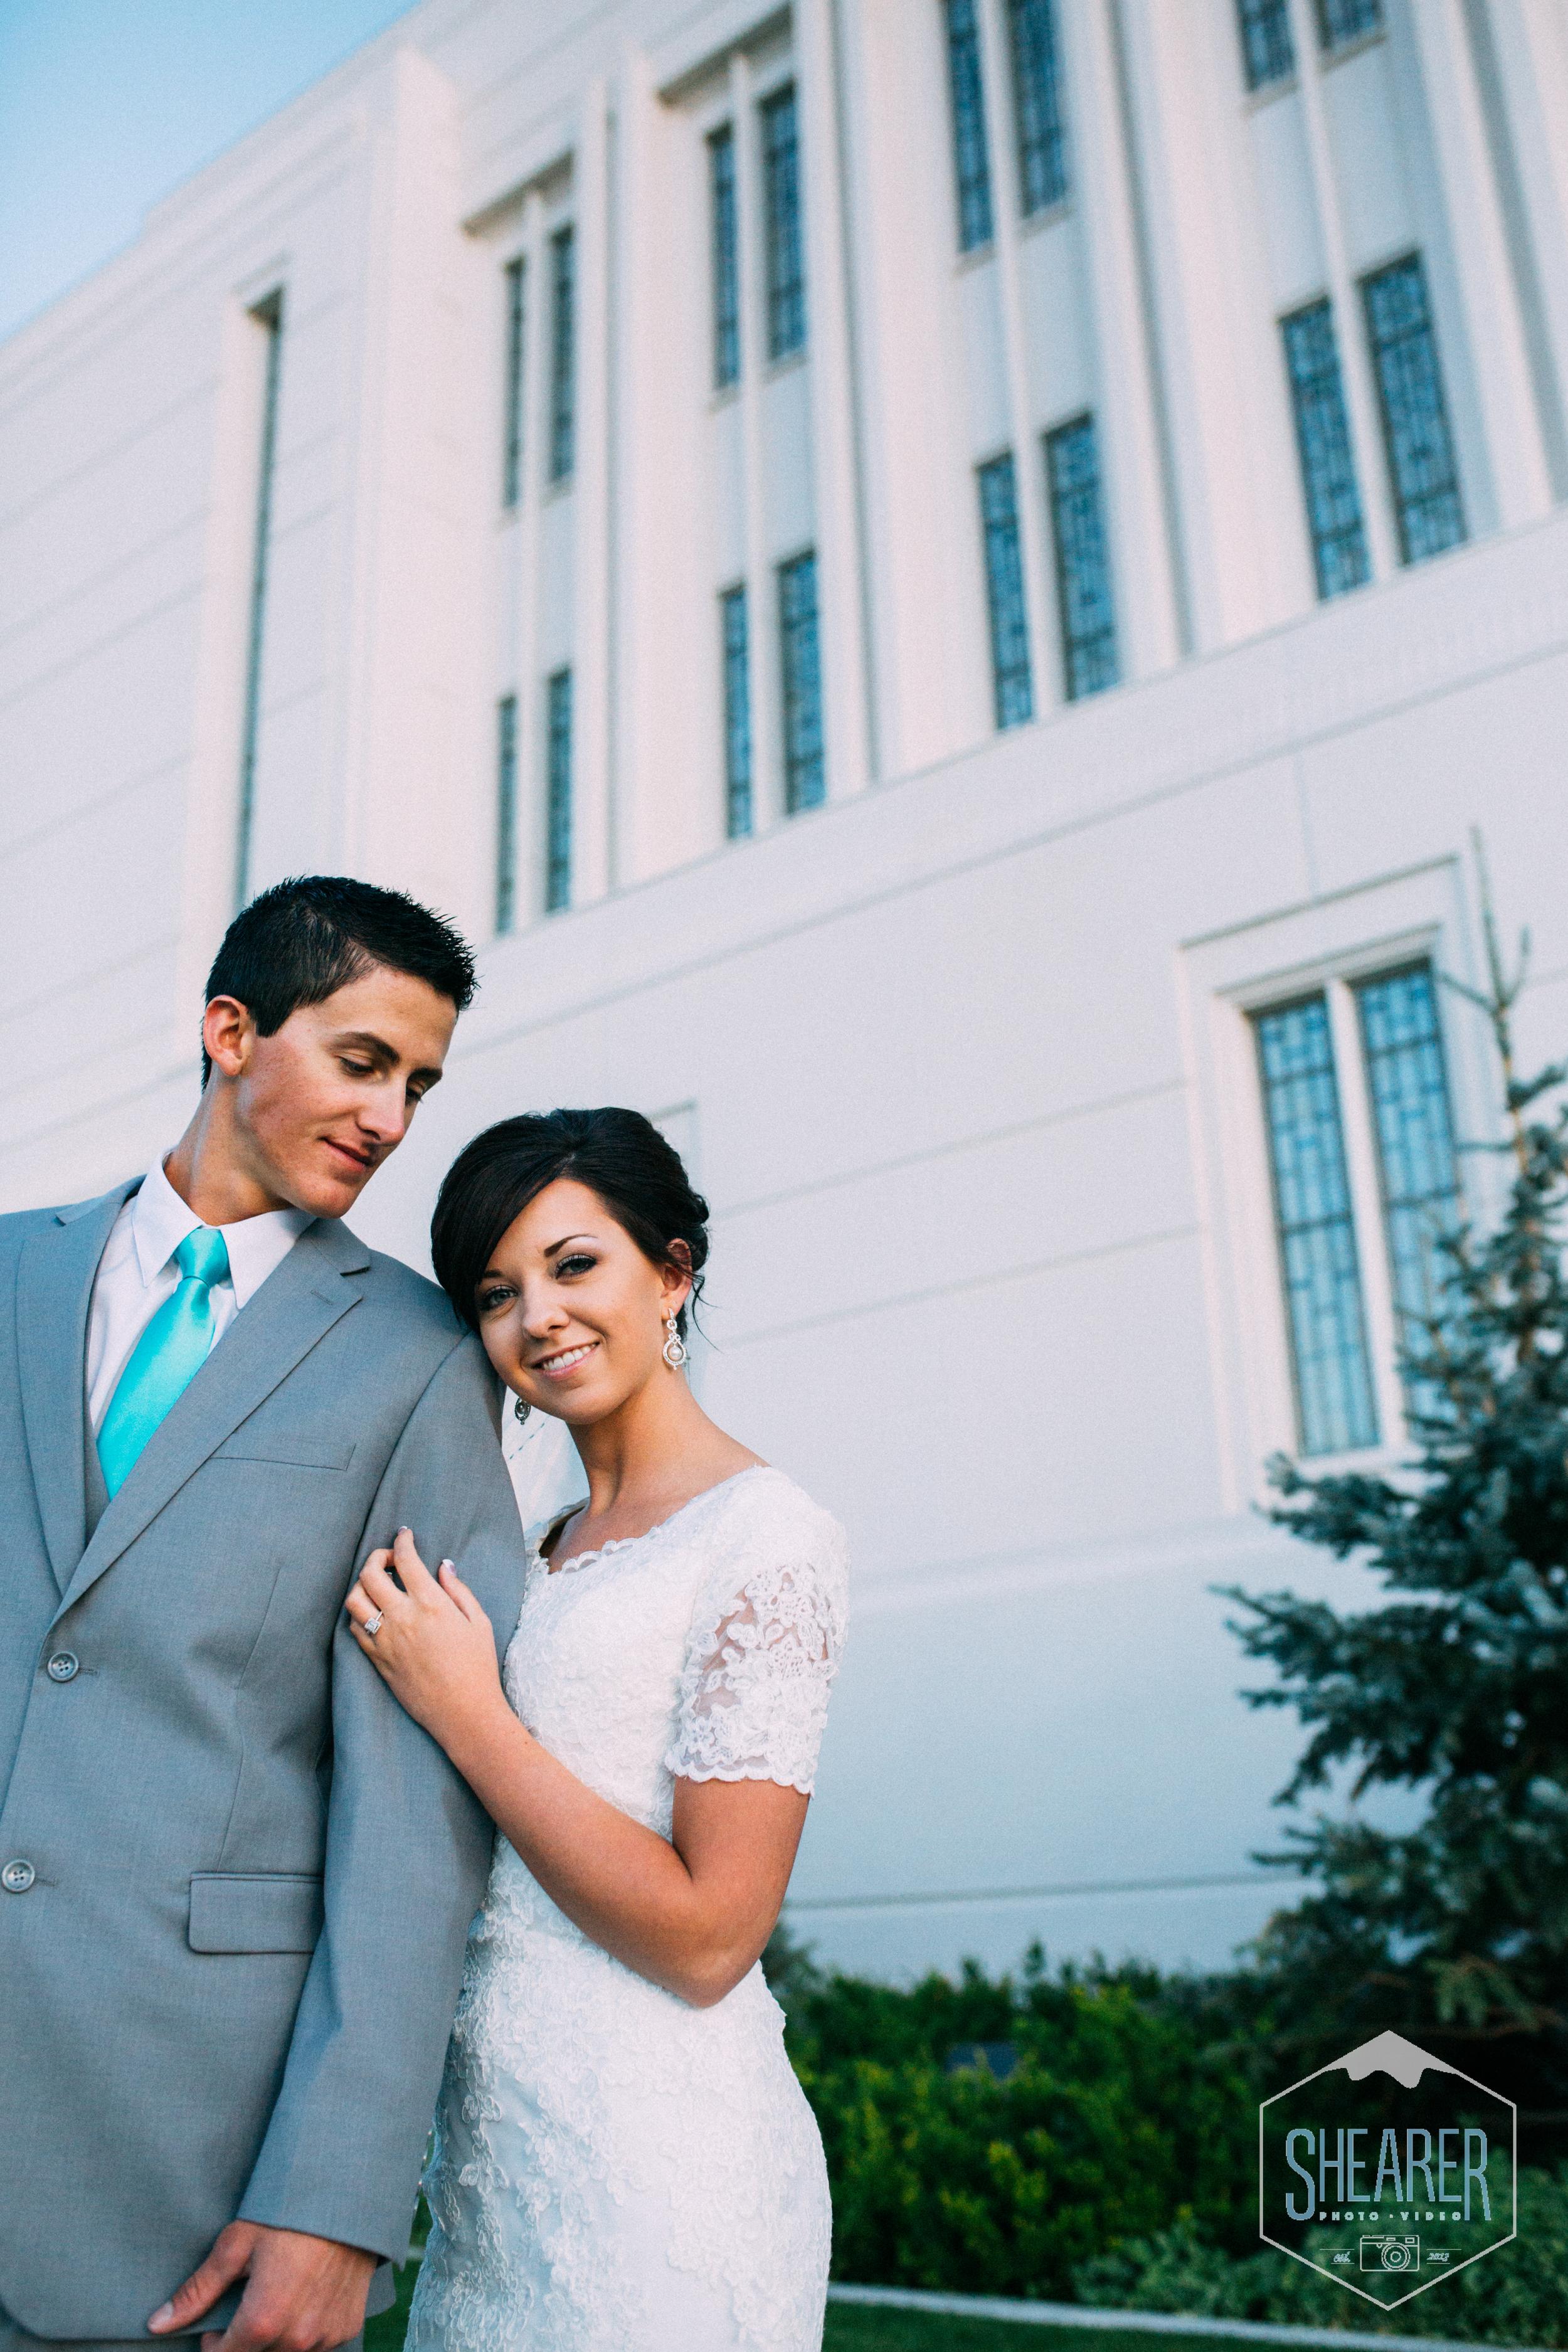 Tyler and Megin Shearer Photo and Video Kayla and Colton bridals wedding rexburg idaho-210.jpg